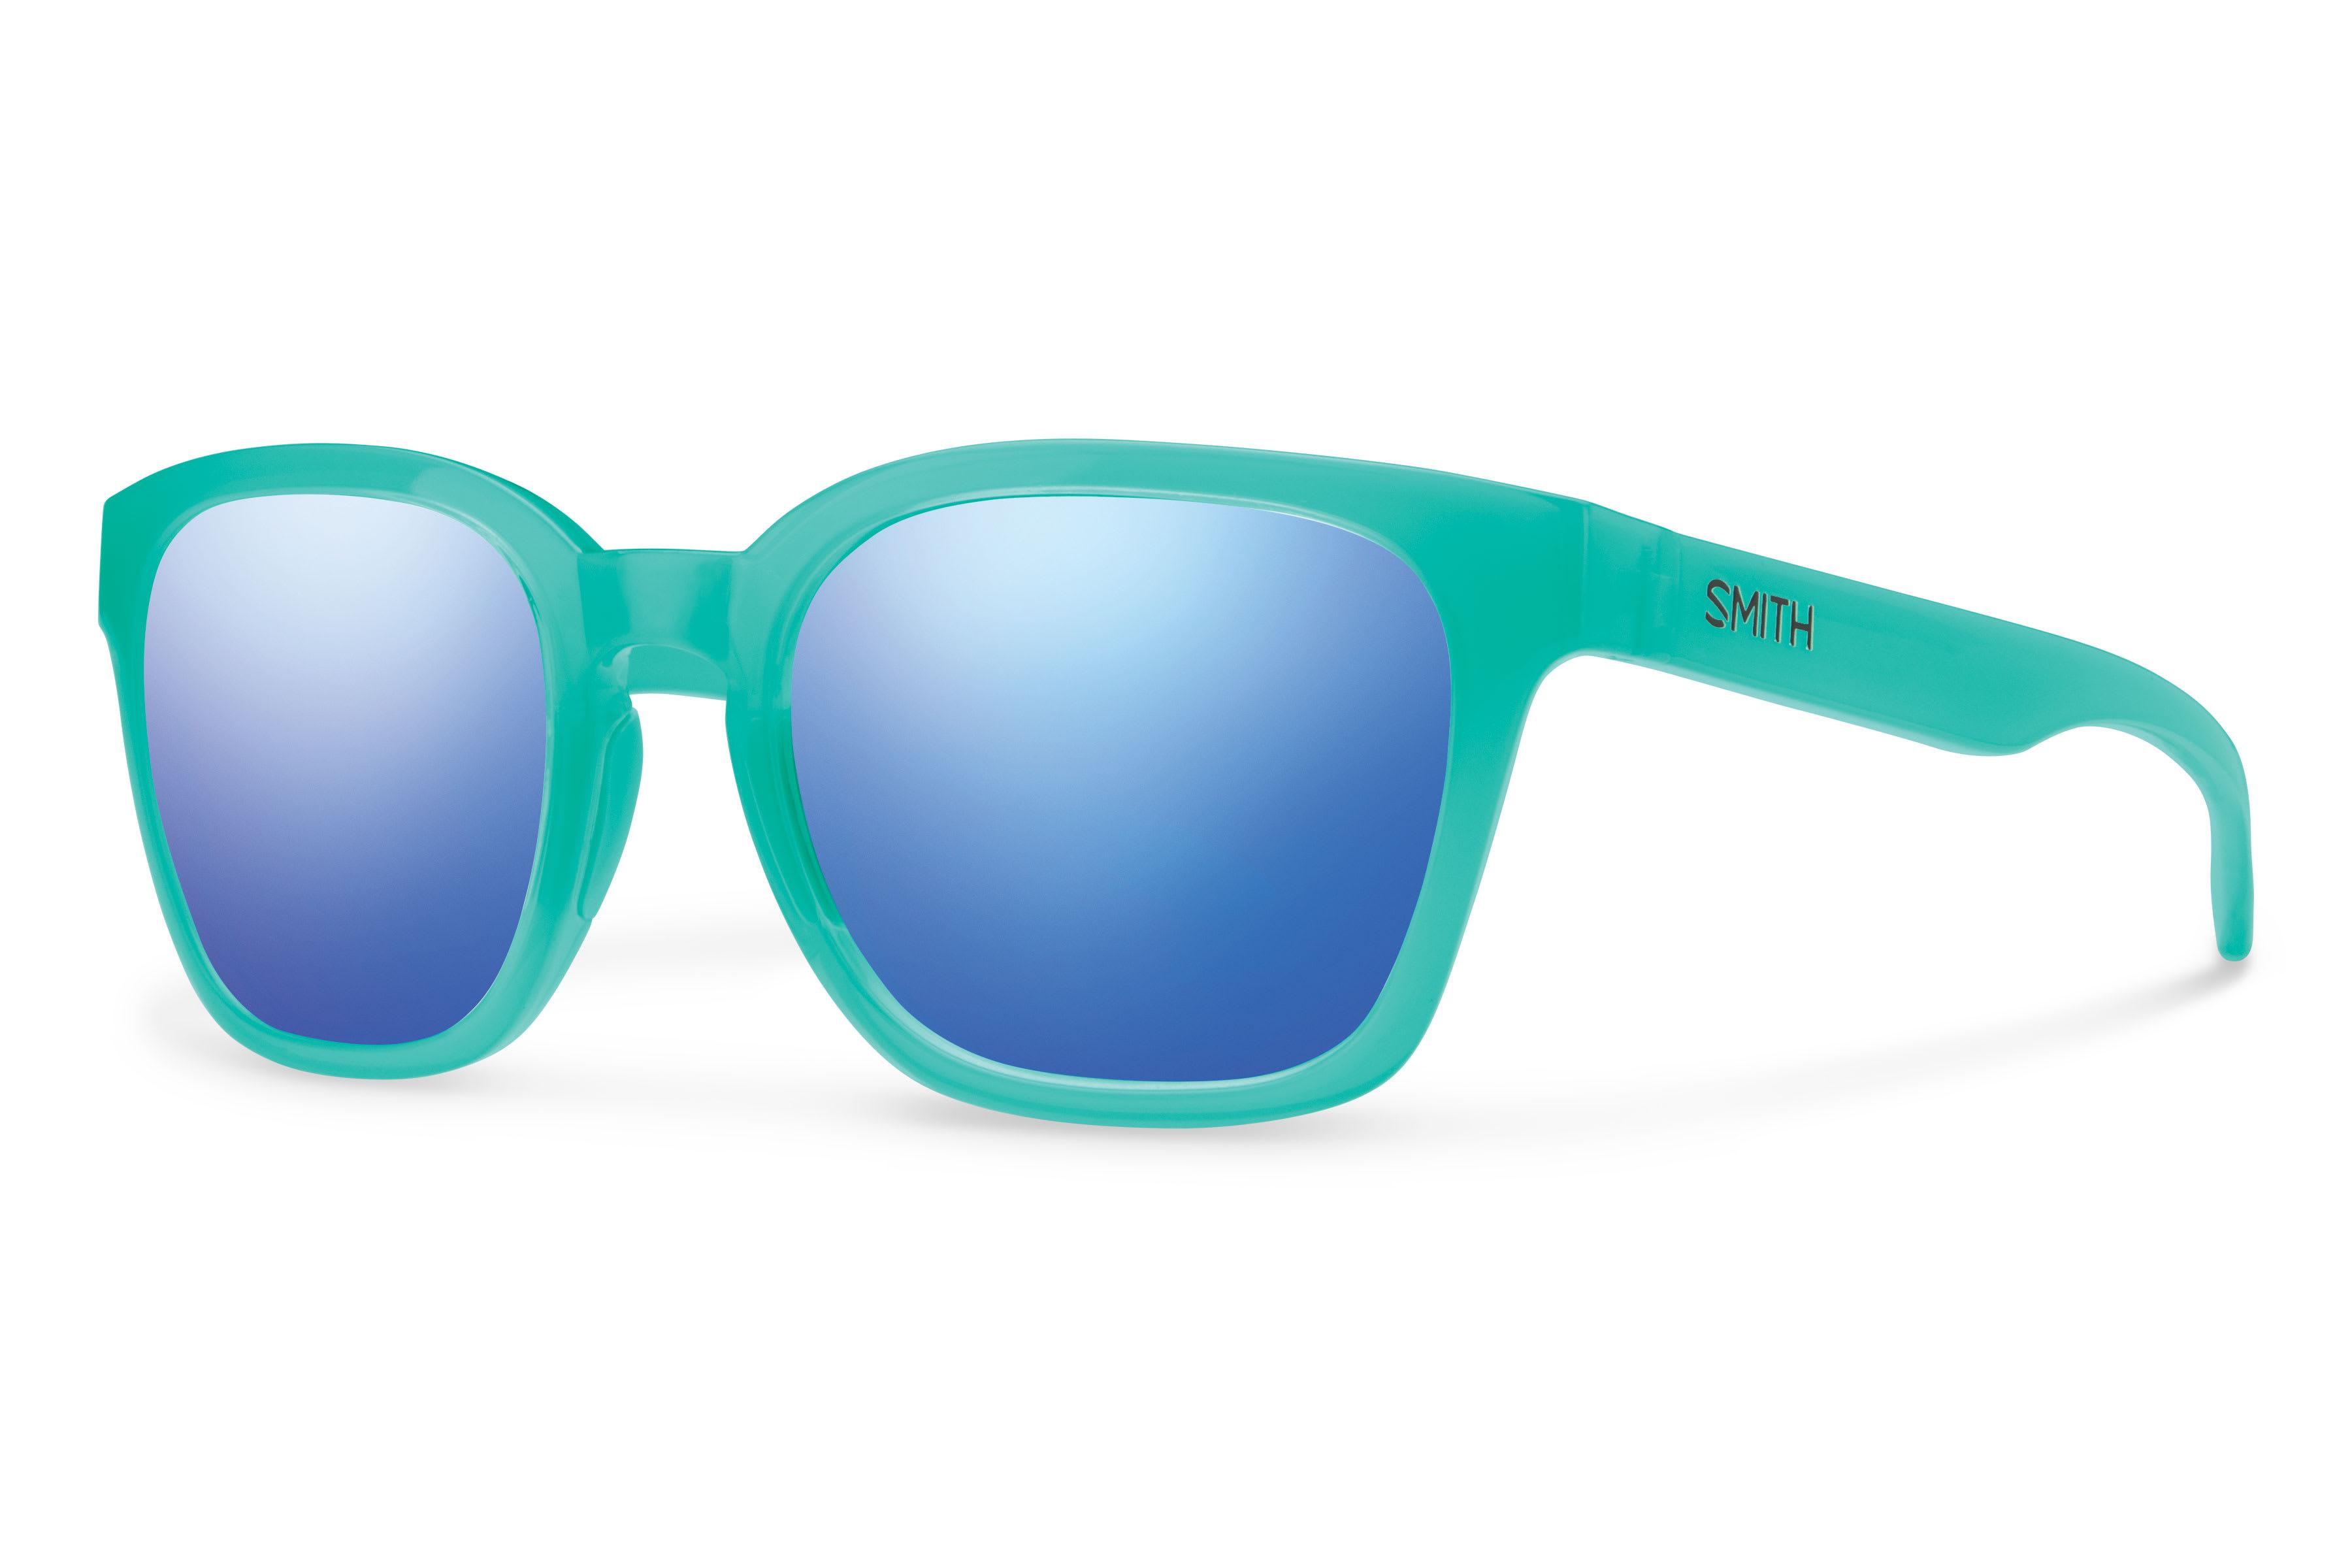 On Sale Smith Founder Slim Sunglasses